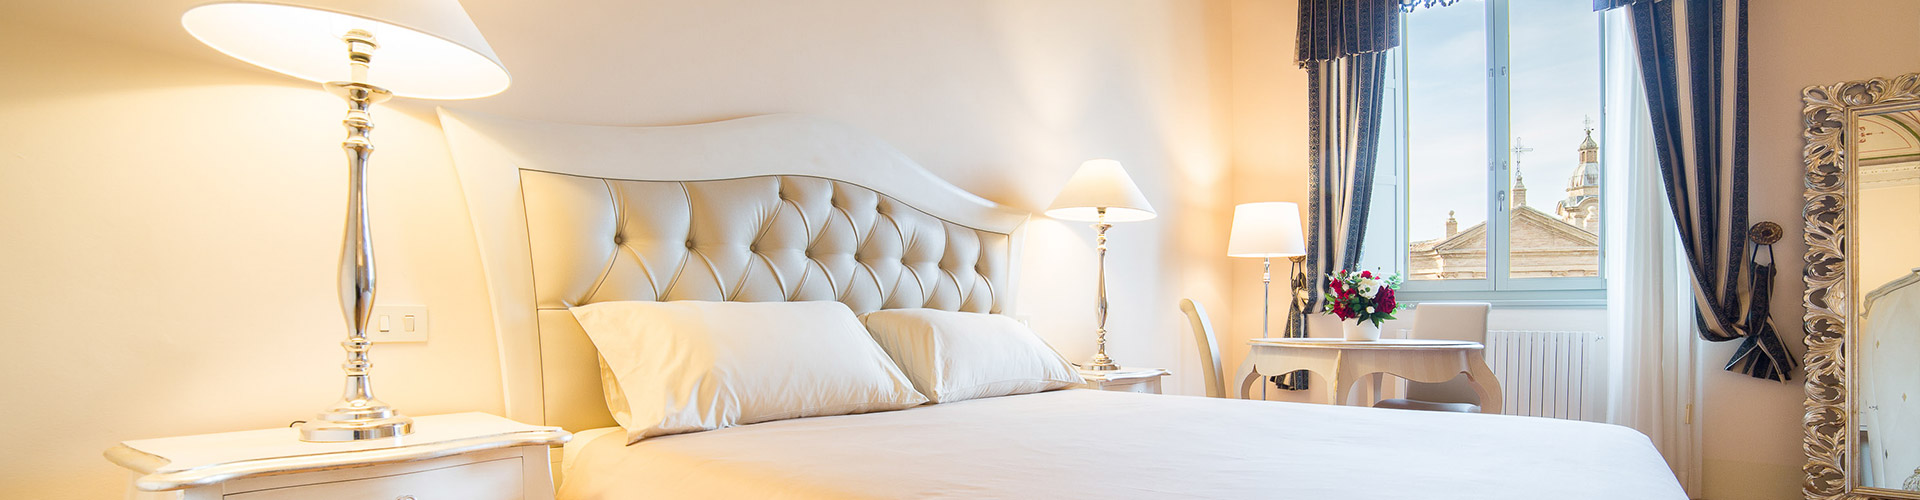 hotel_palazzo_gentili